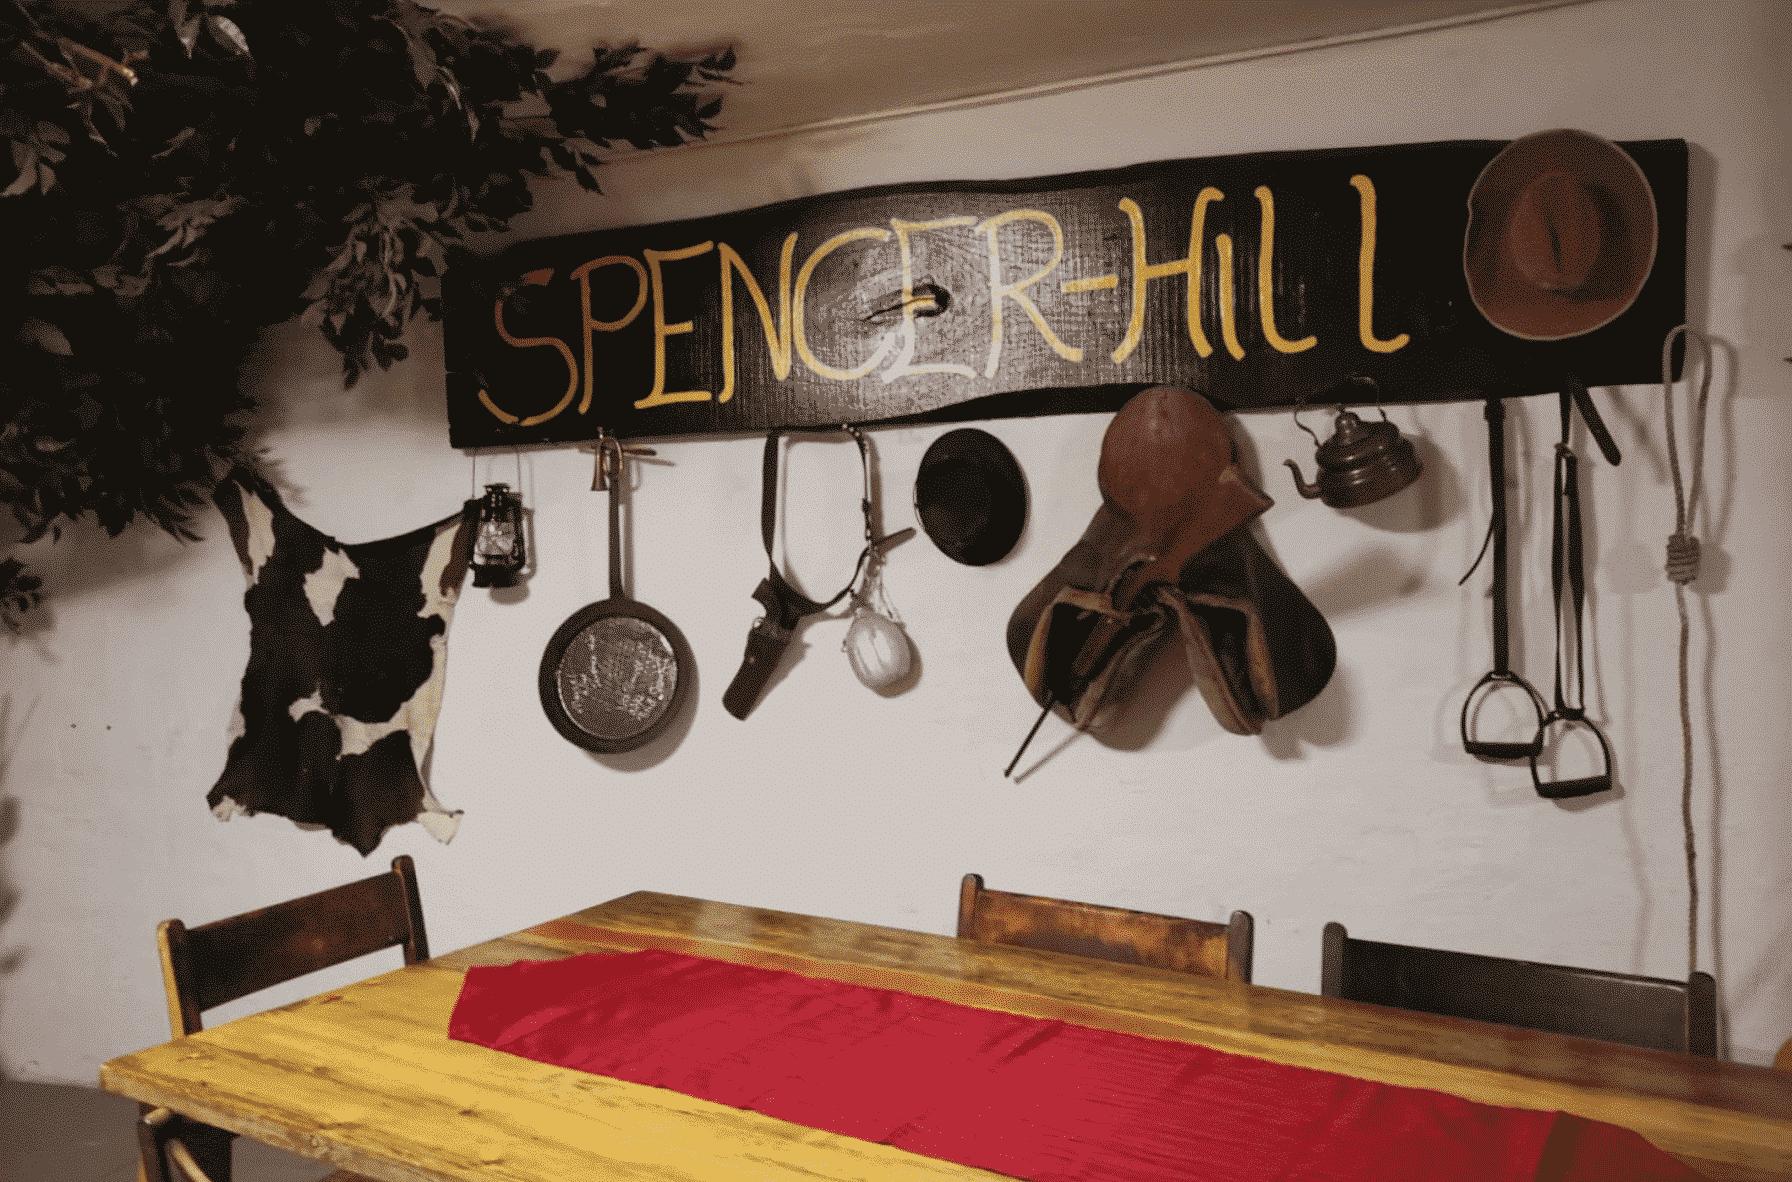 spencerhill-restaurant-schwerin